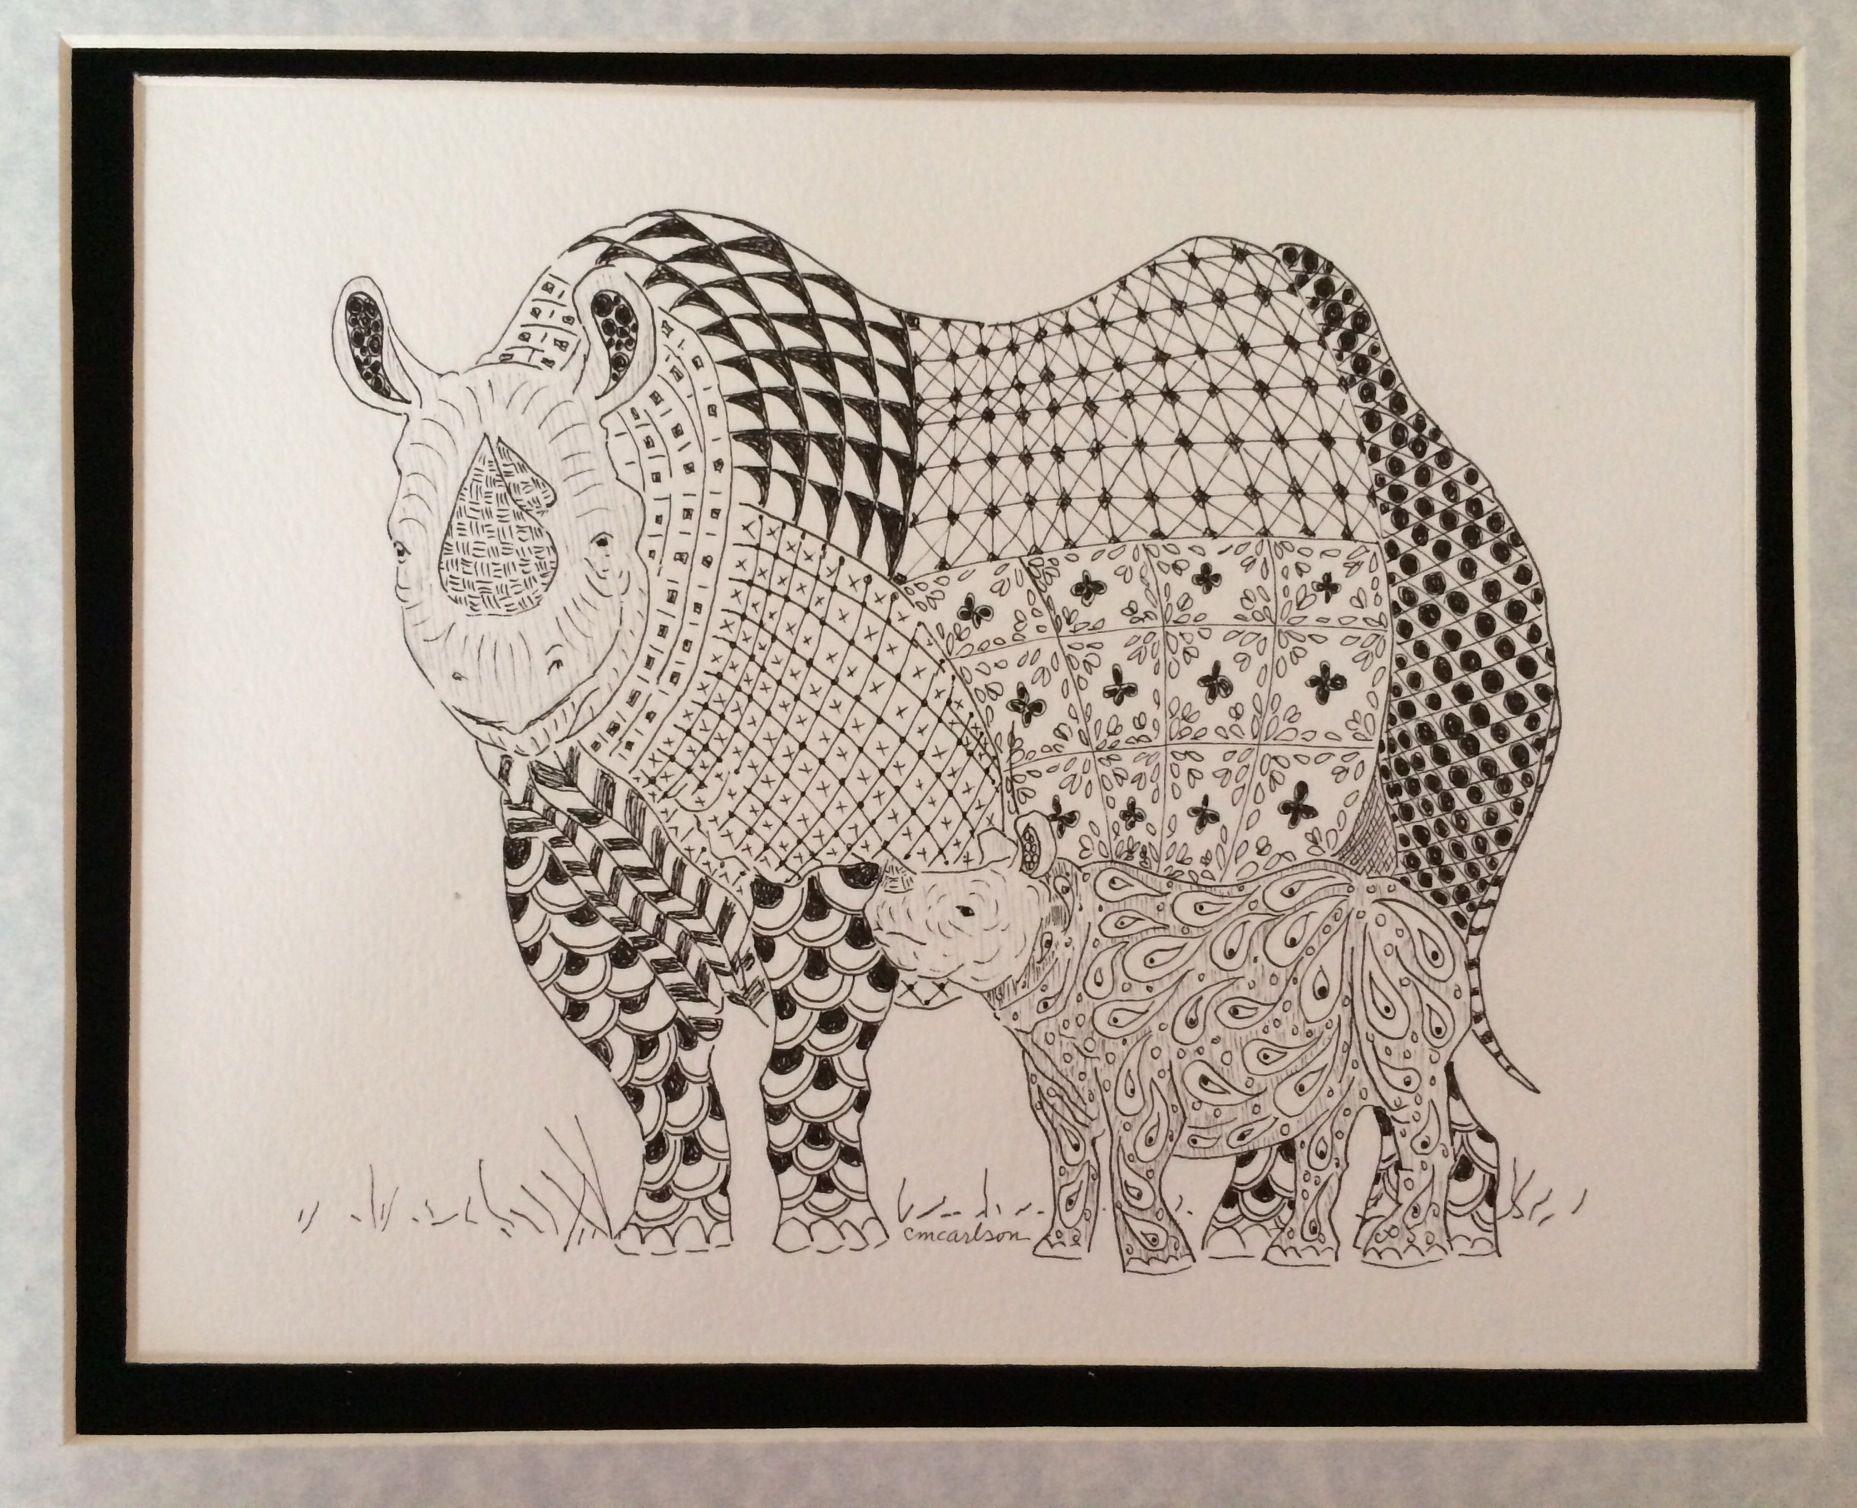 Zentangled rhino with paisley calf